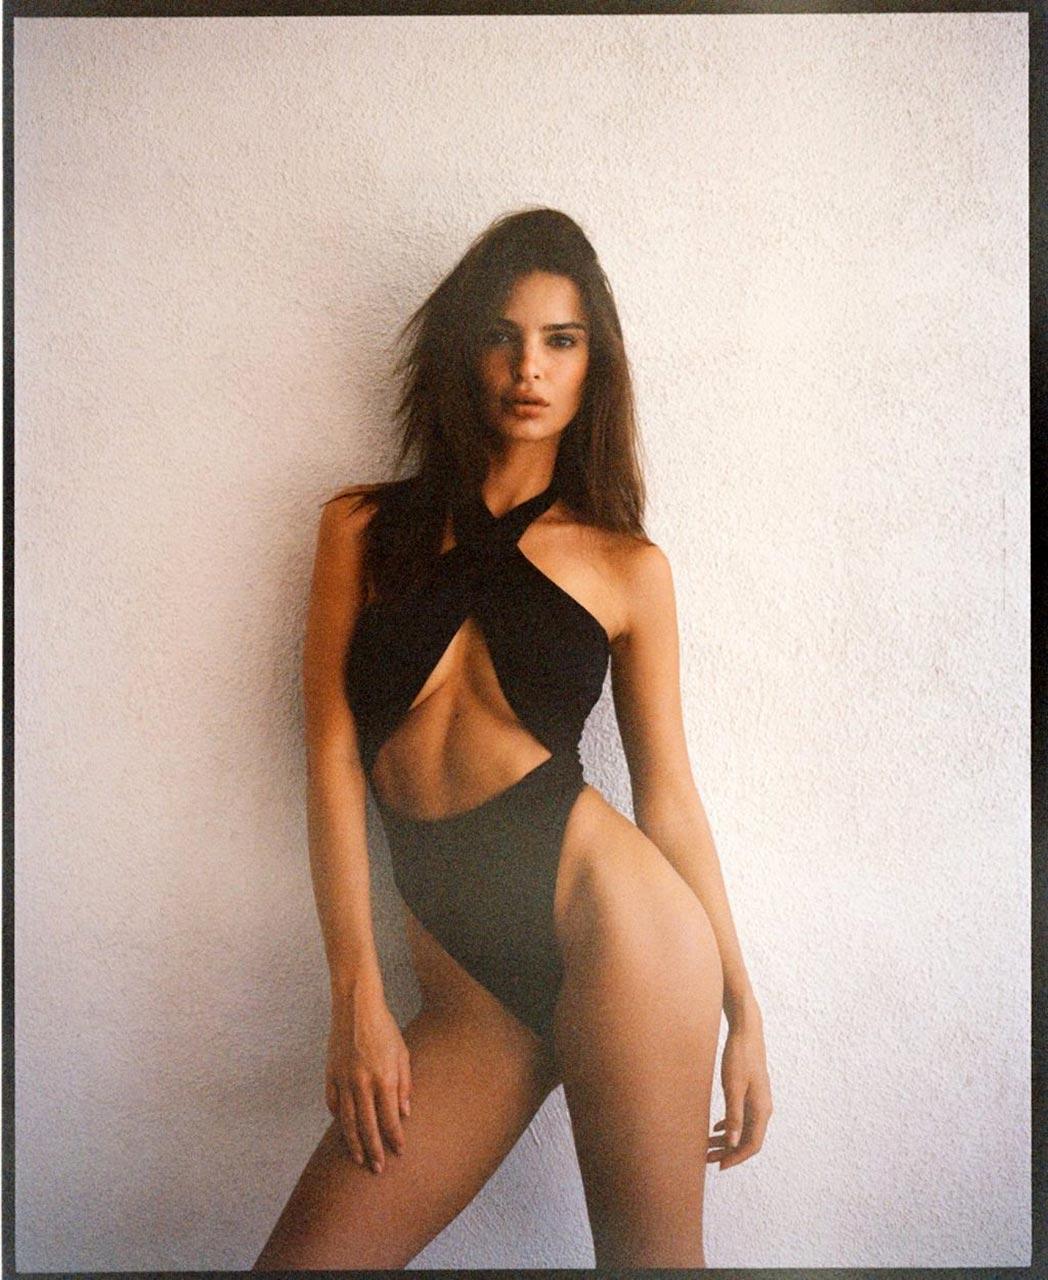 Emily Ratajkowski Leaks (35 Photos) - ( ͡° ͜ʖ ͡°)  The